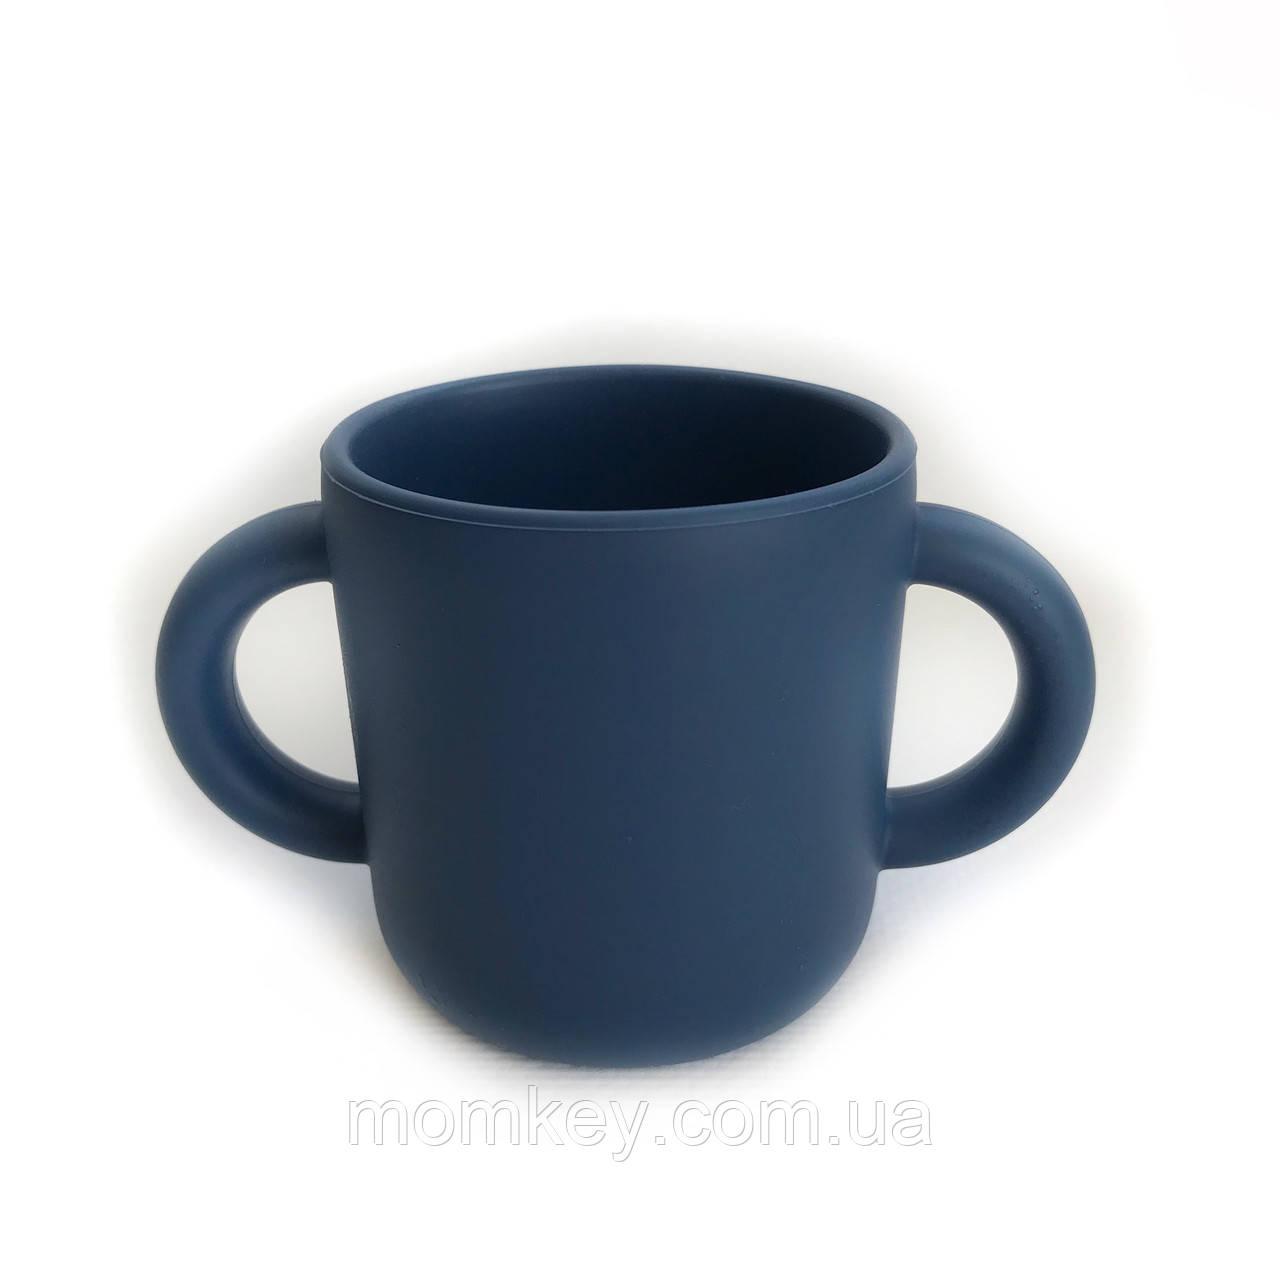 Чашка с двумя ручками (темно-синий)